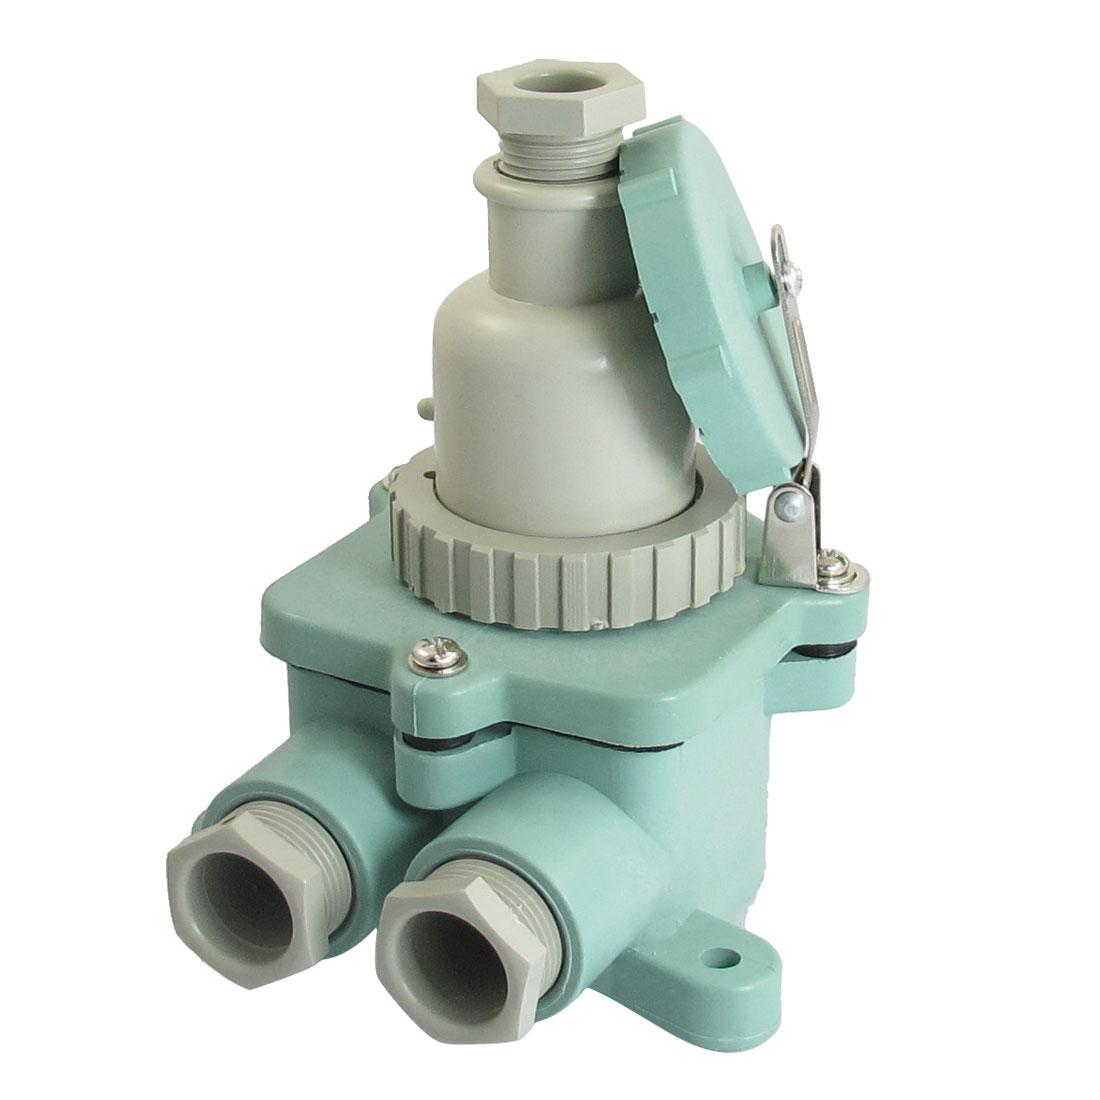 24V DC 10A 2P Waterproof Marine Plug Socket Set Junction Z-M/T-MA